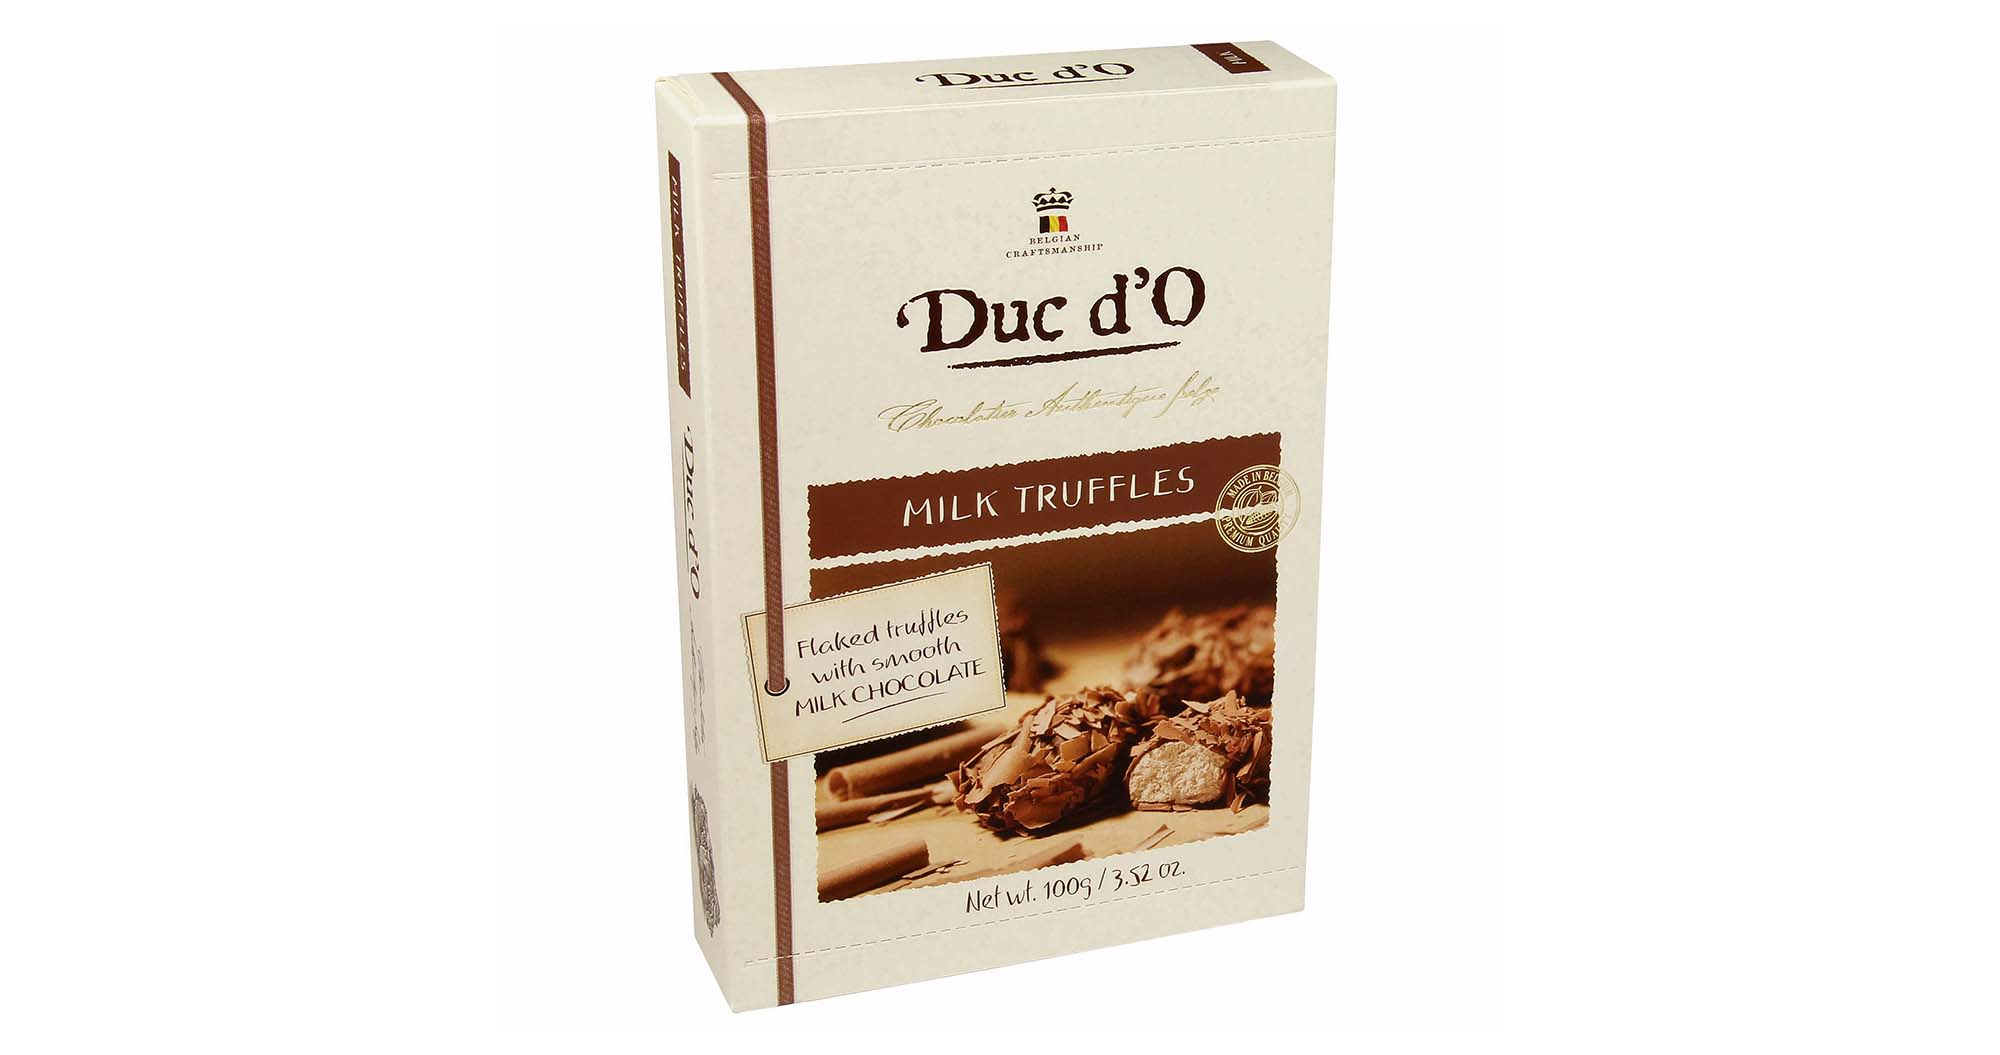 103-30007-999 Truffles milk 100g (103-30007-999)